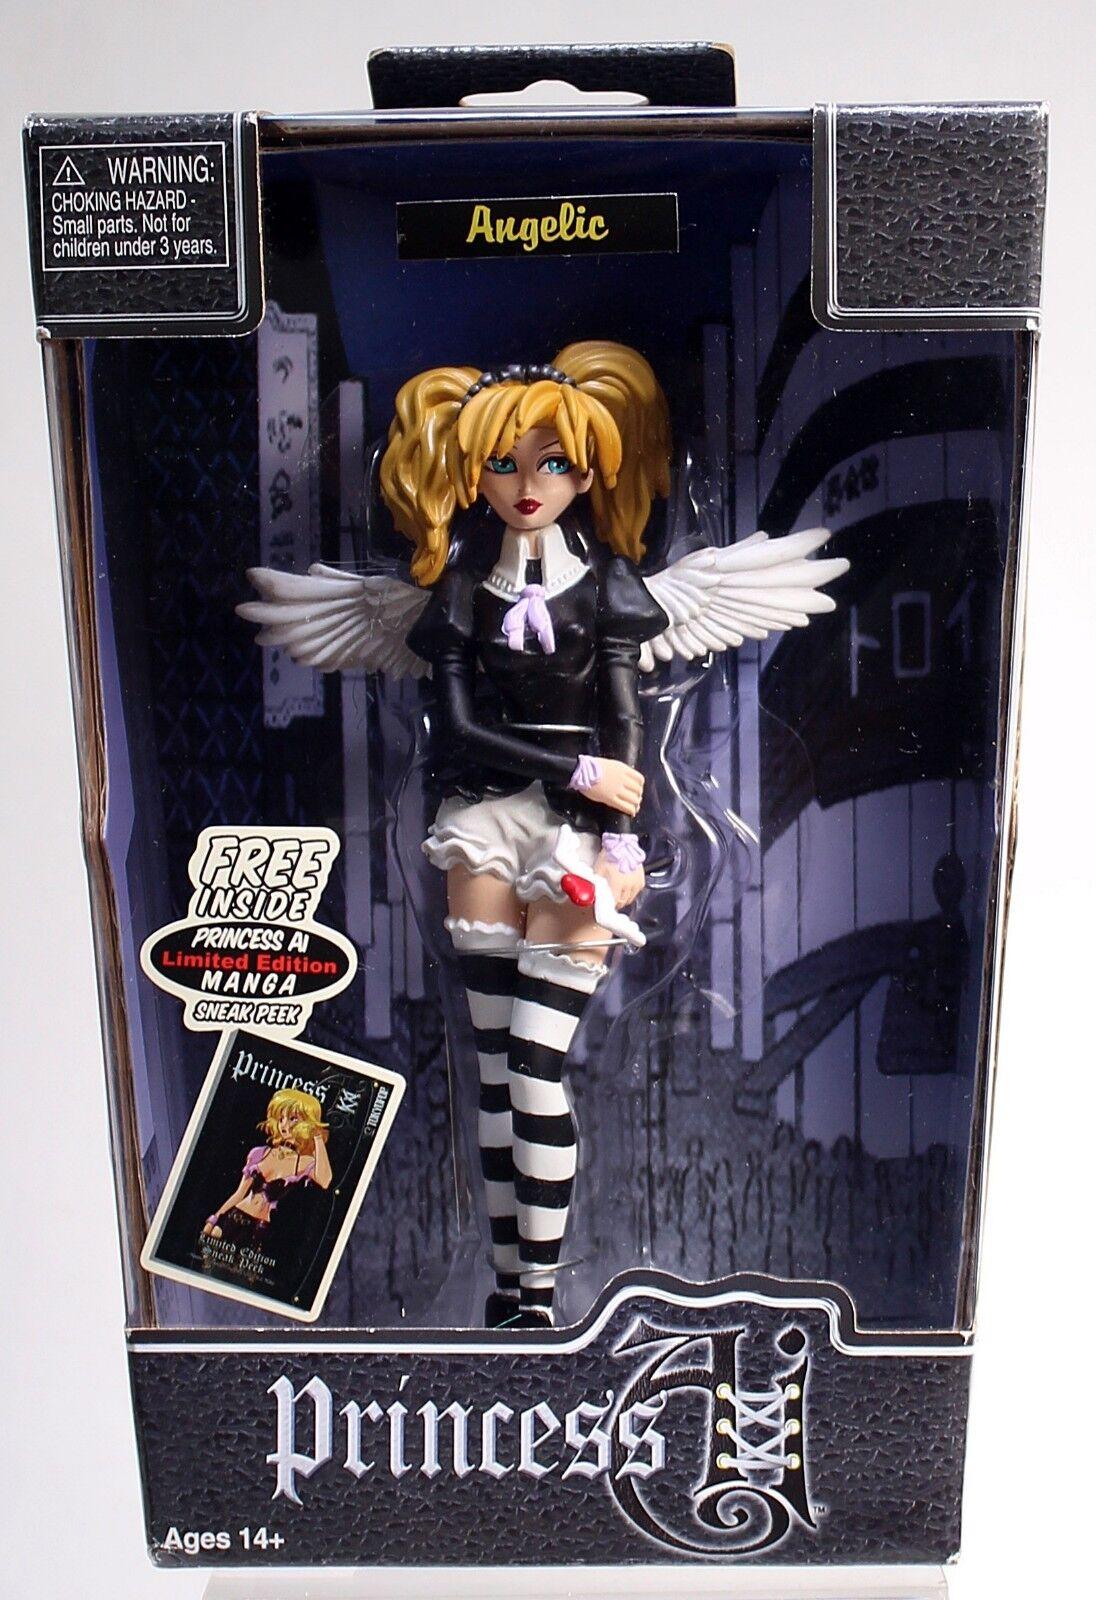 PRINCESS AI ANGELIC TOKYOPOP Manga 8  Girl DOLL FIGURE NIB 2005 Bleeding Edge